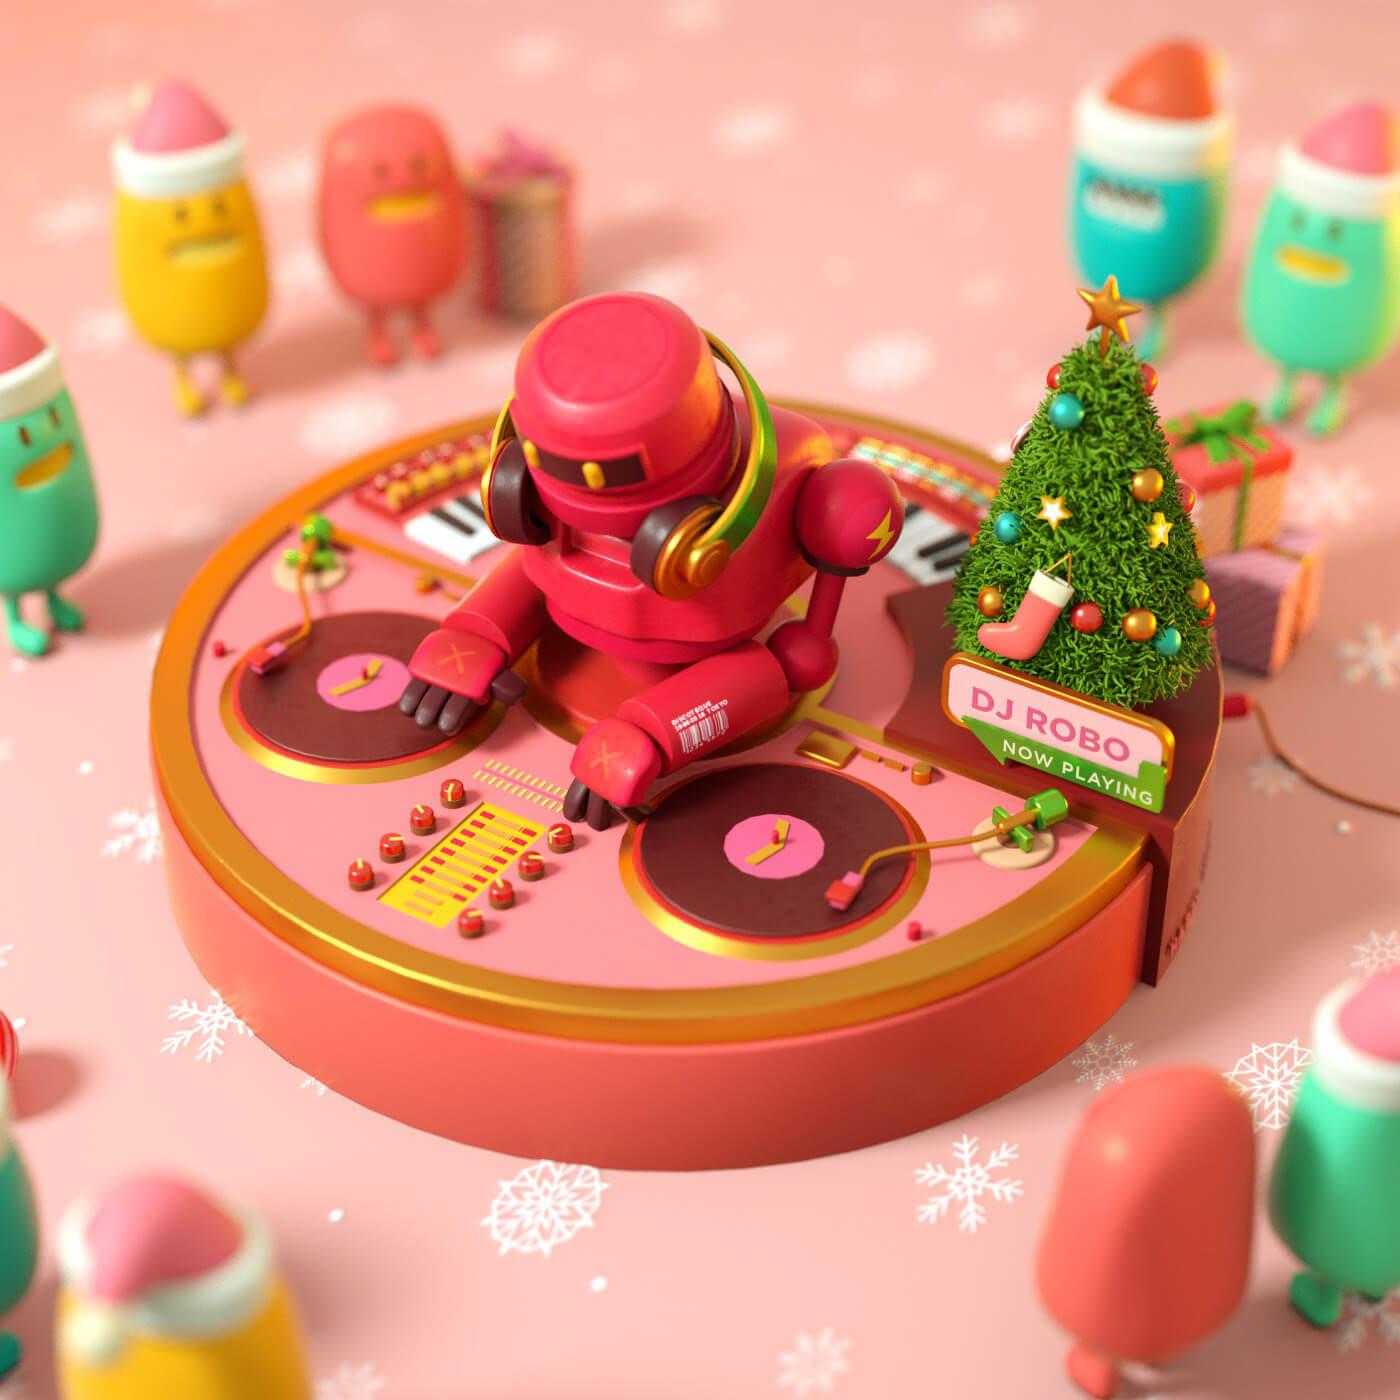 DJ ROBO ILUSTRACION 3D TOYODA